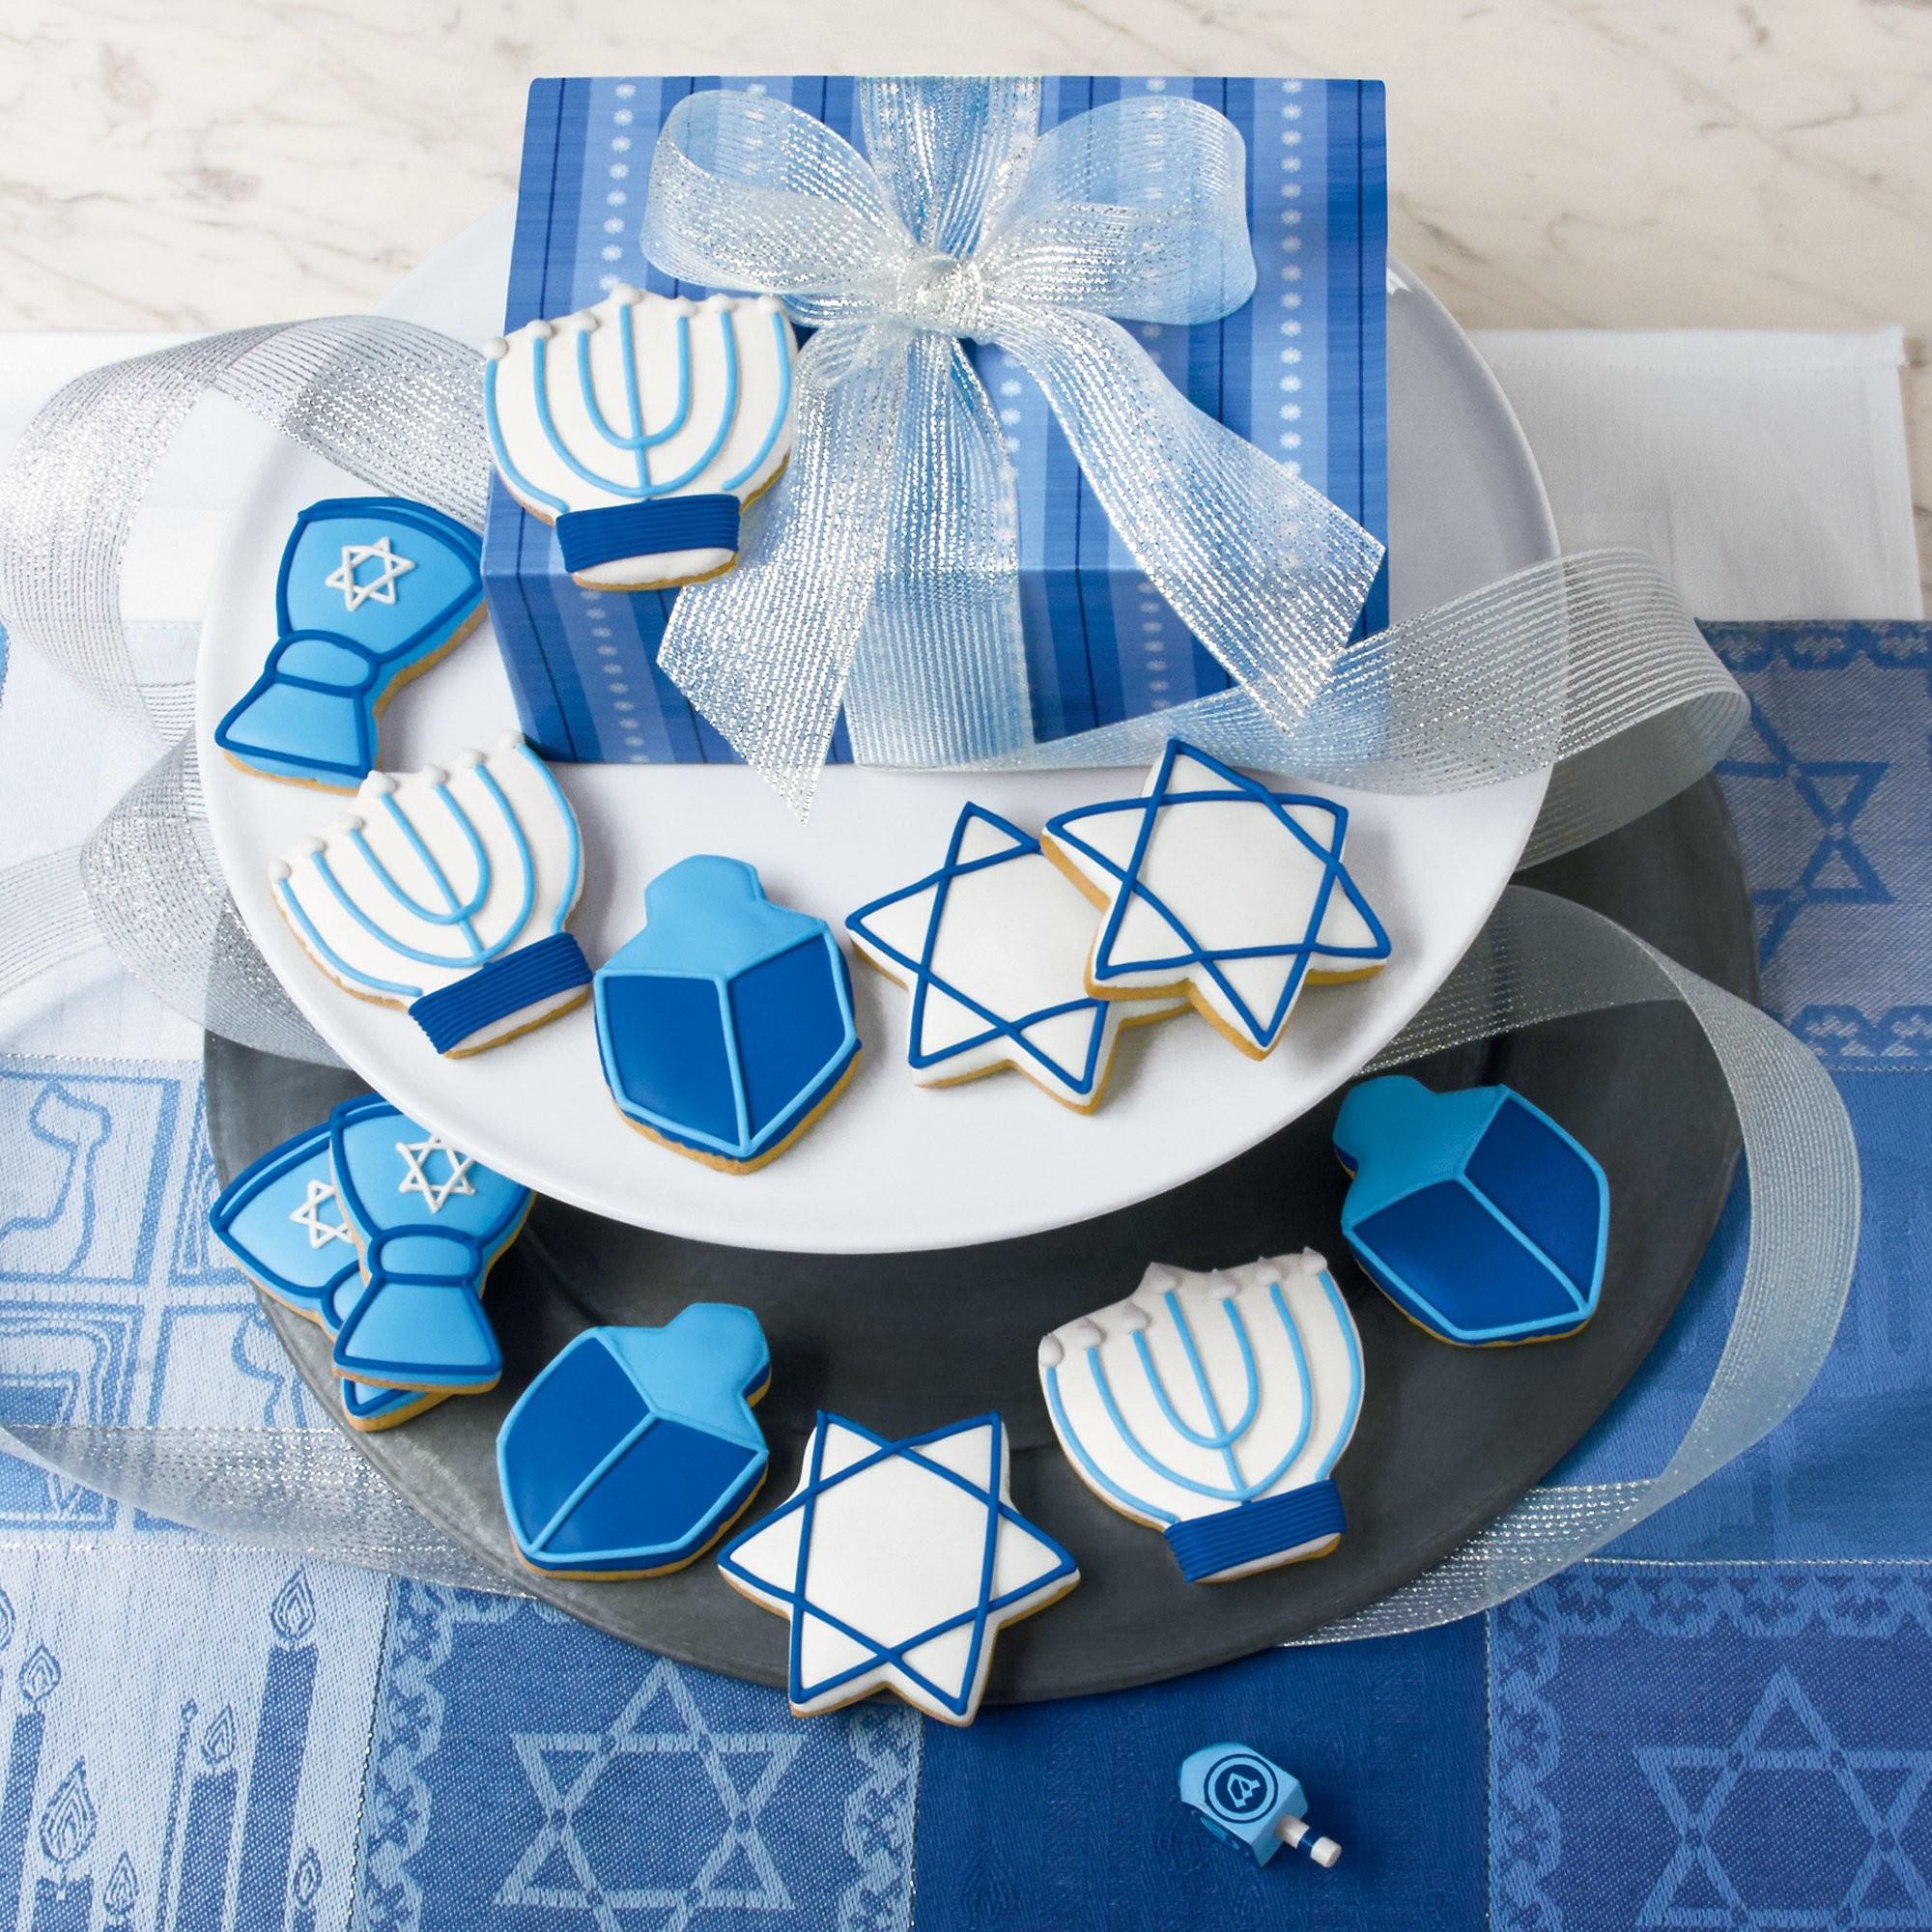 Jewish Wallpaper HD (62+ Images